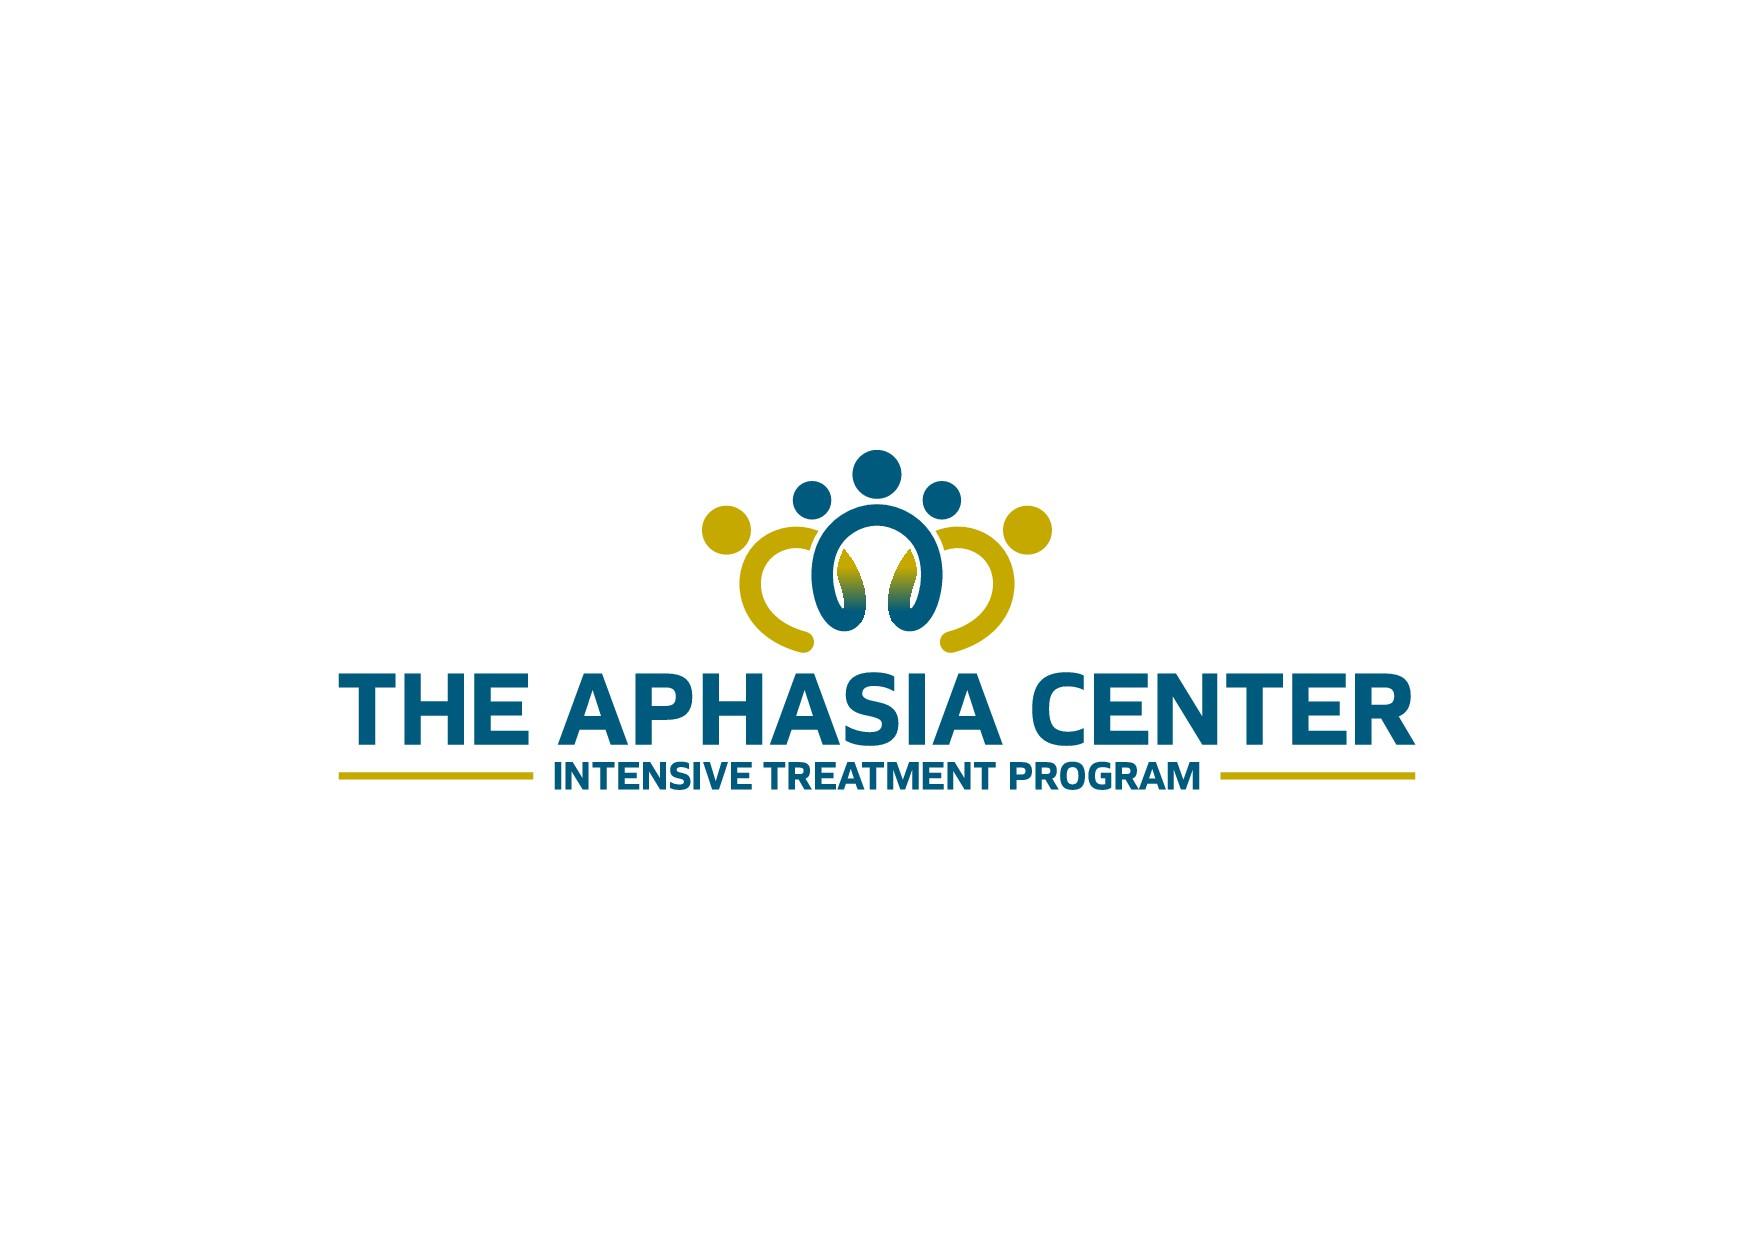 Update a tired logo to help stroke victims speak again